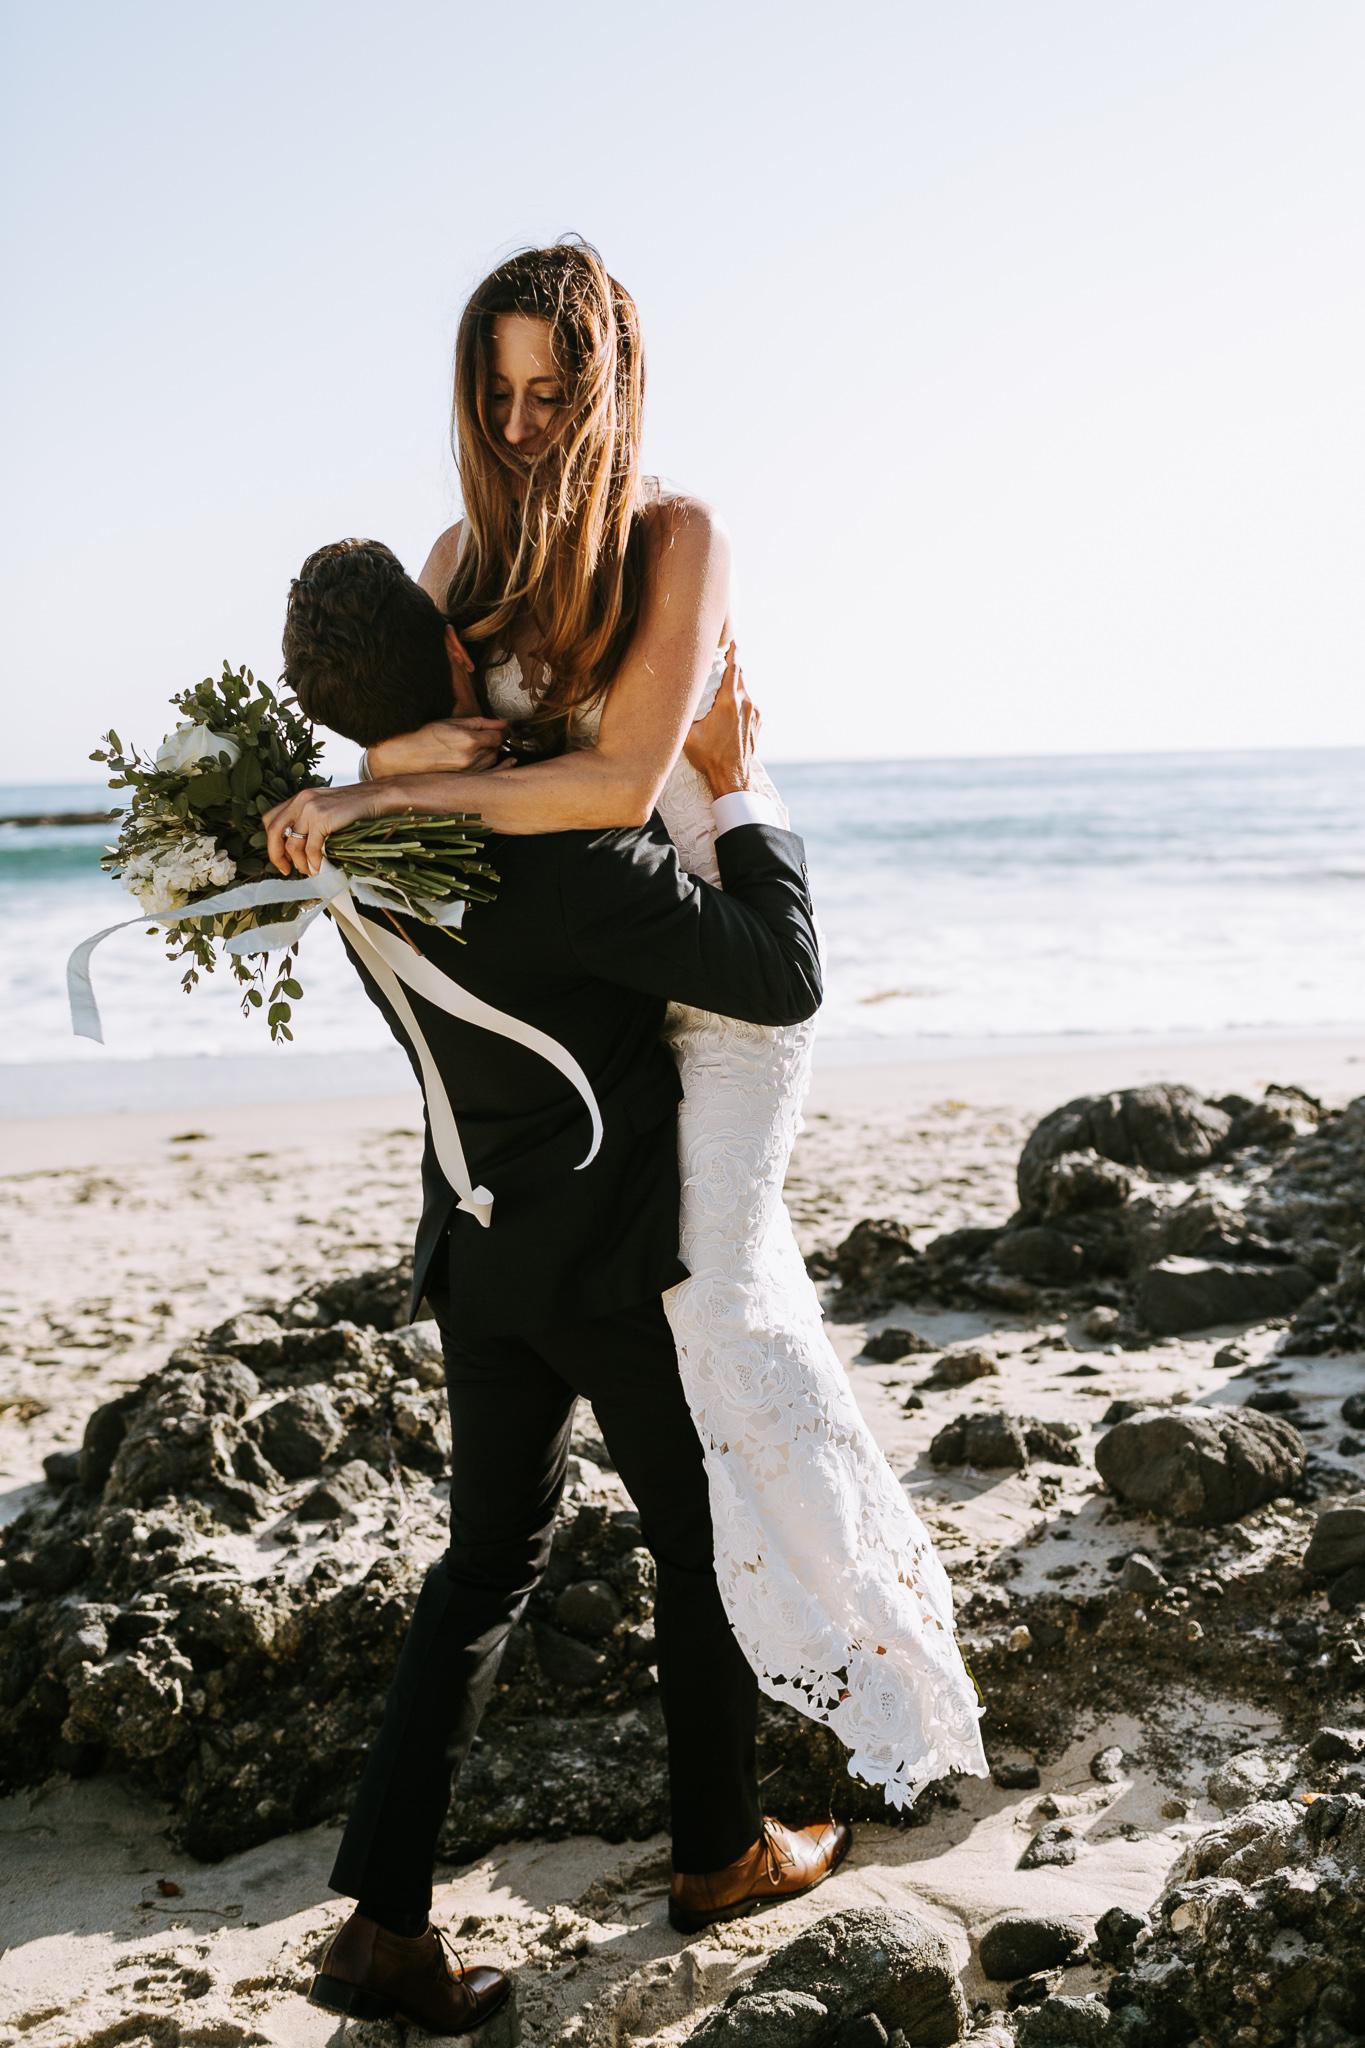 LagunaBeach-WeddingPhotographer-42.jpg